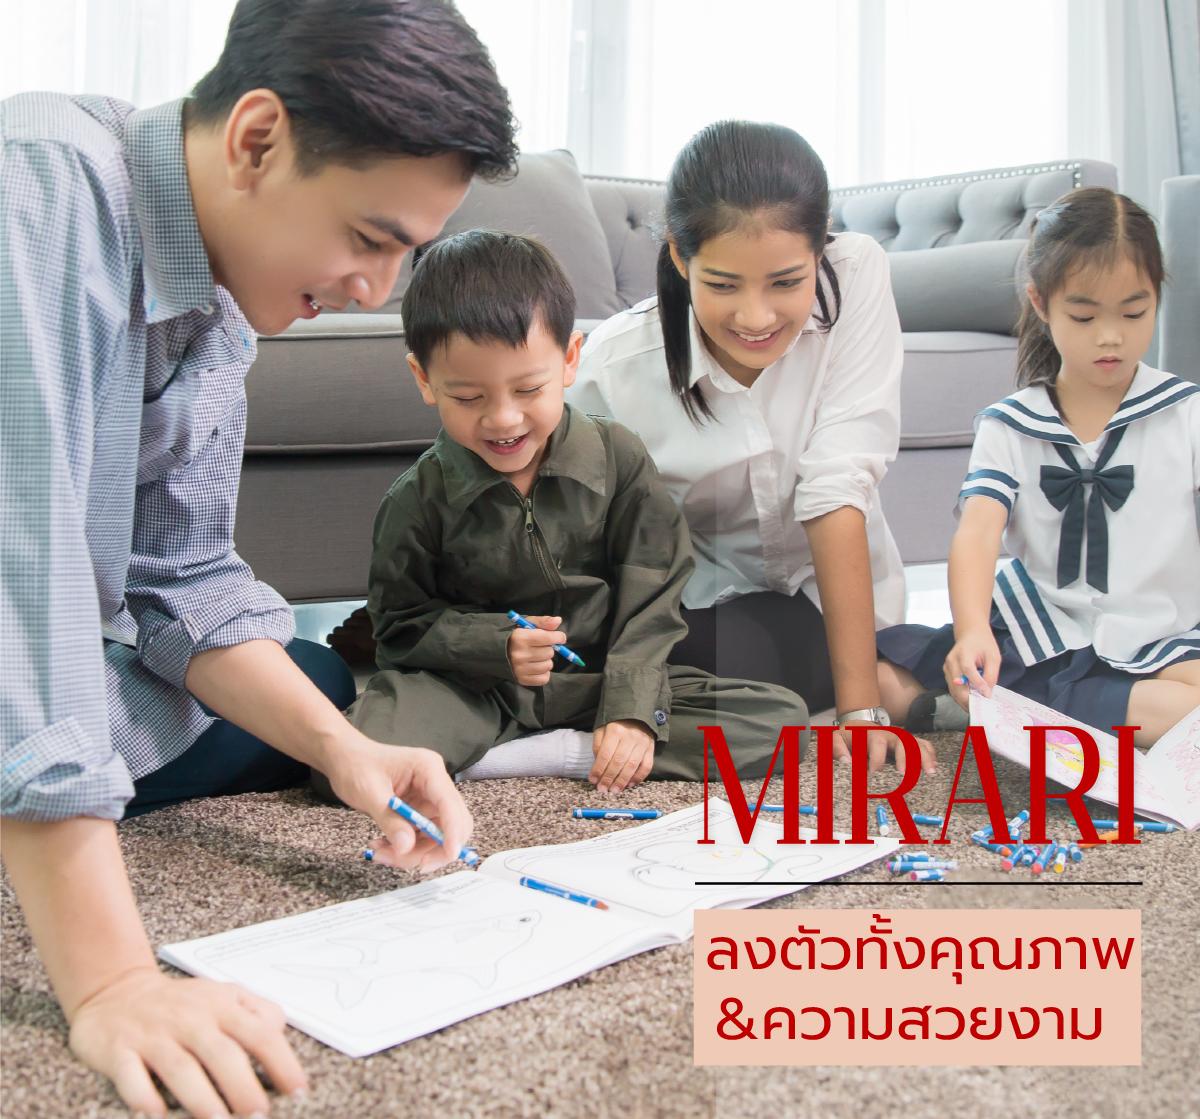 Mirari-Home_Banner-04_EDIT-16-Aug